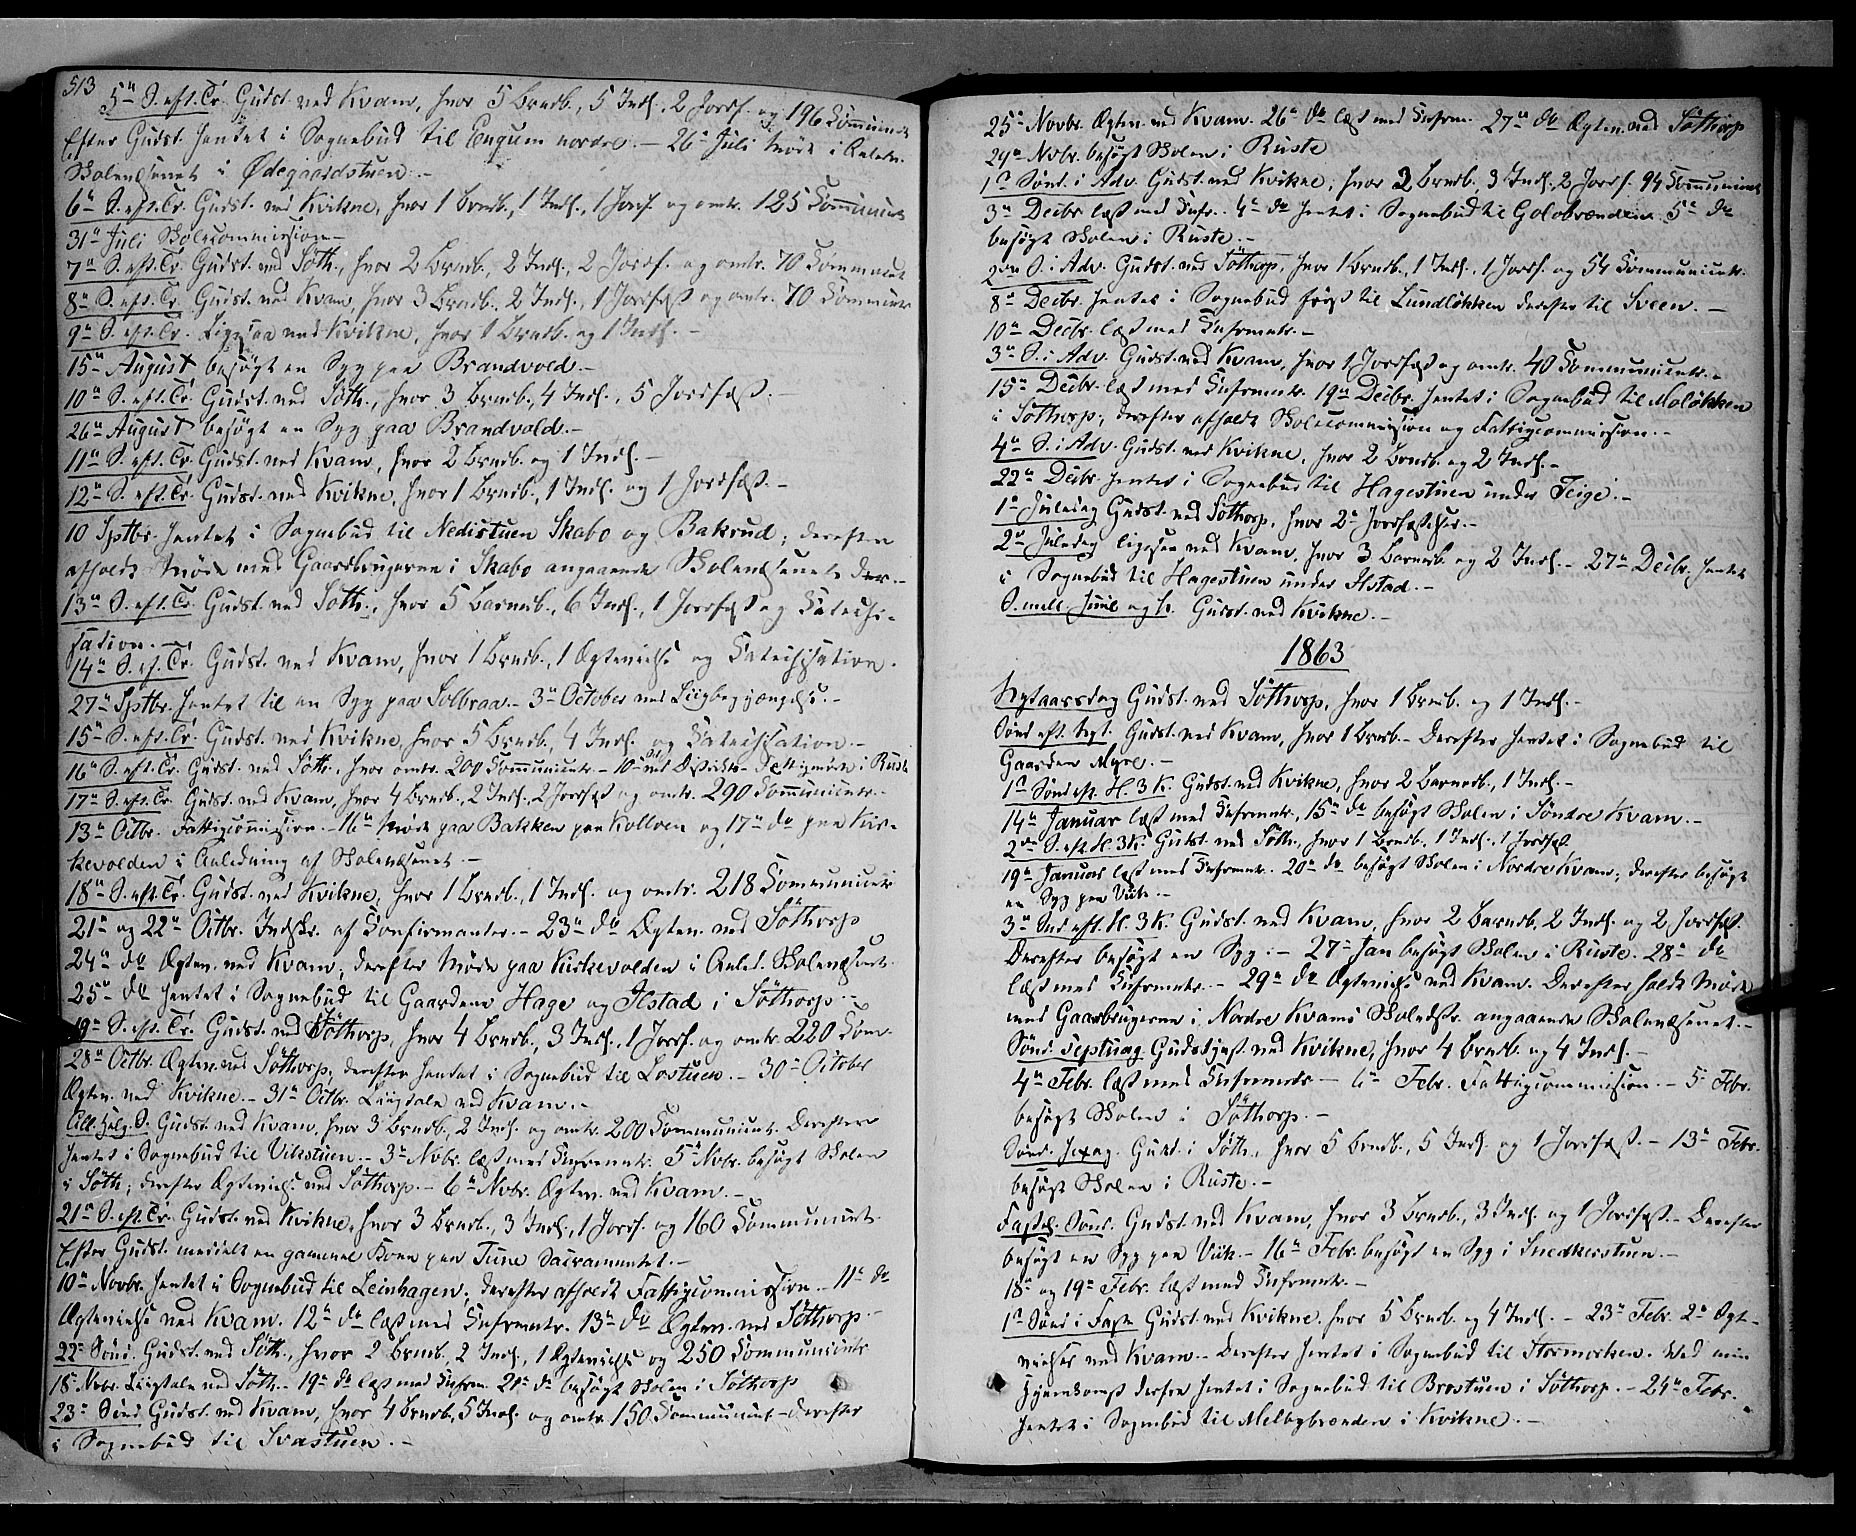 SAH, Nord-Fron prestekontor, Ministerialbok nr. 1, 1851-1864, s. 513